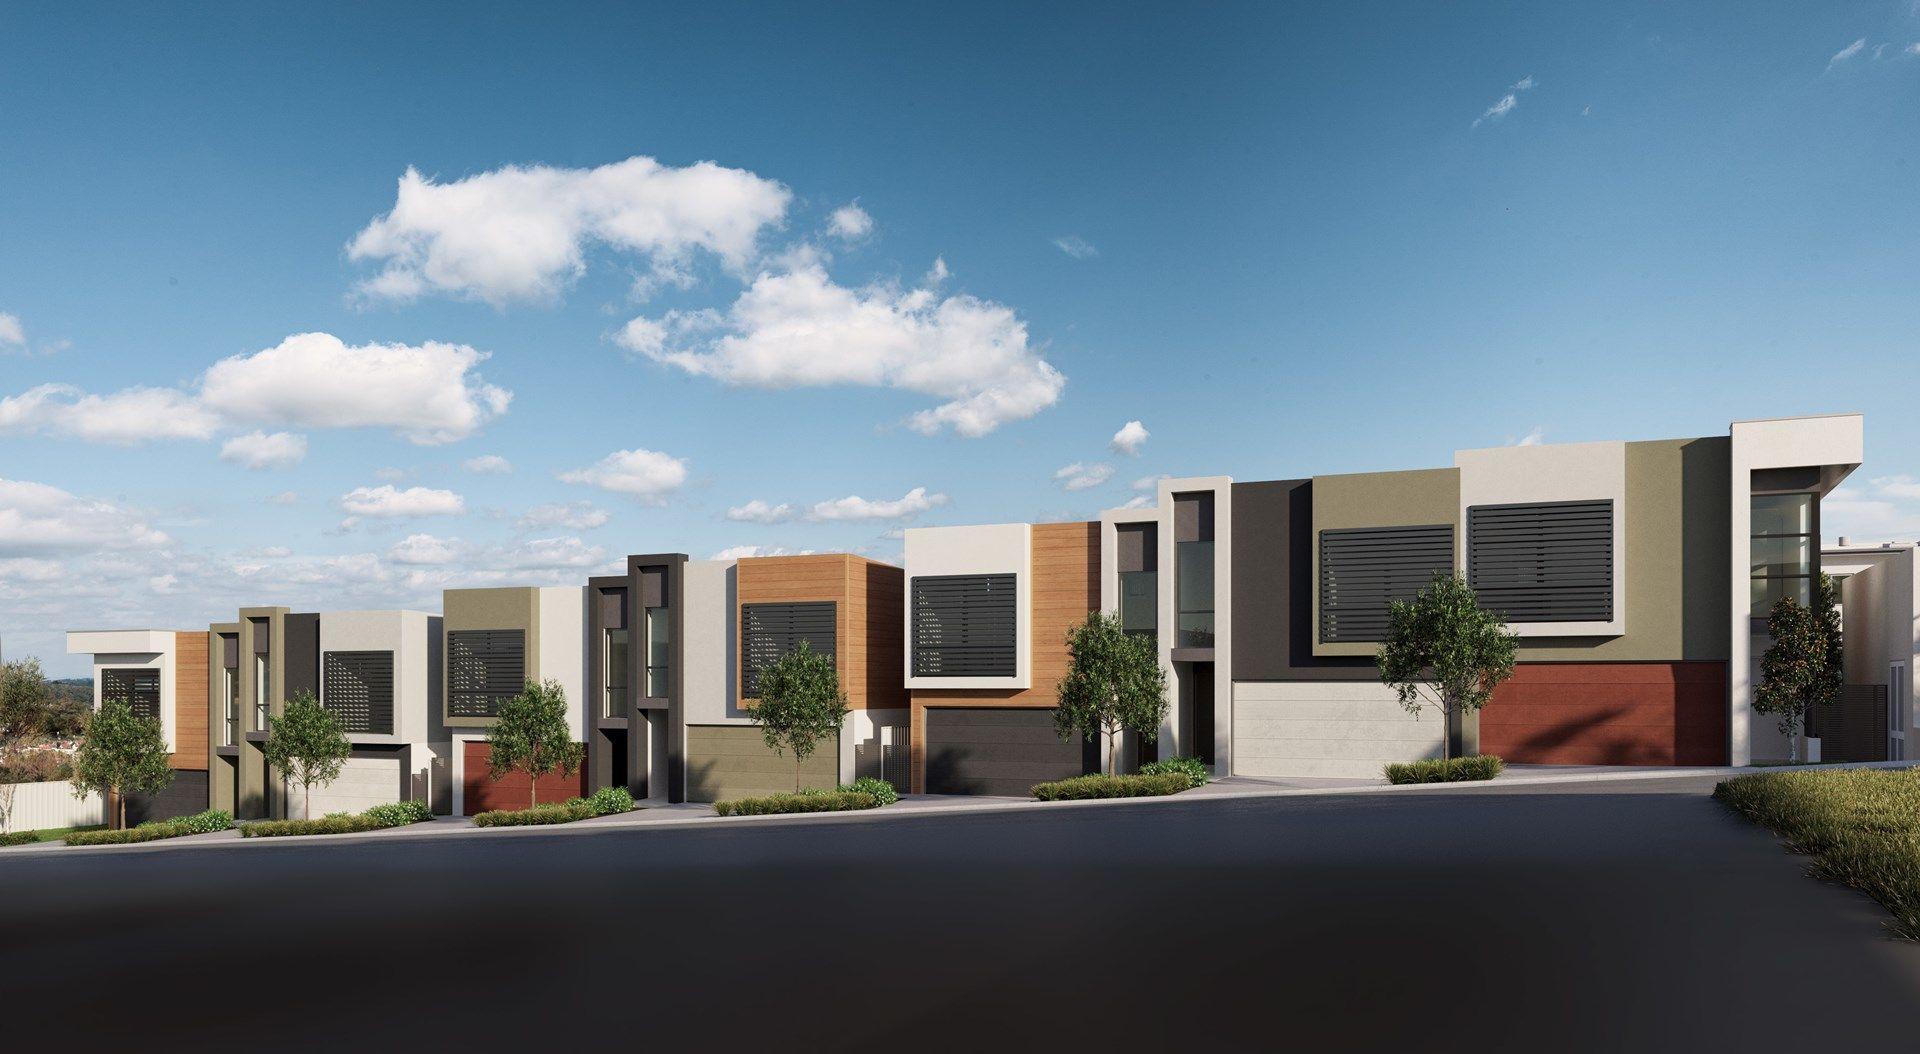 3-15 Starbush Place, Kellyville NSW 2155, Image 0